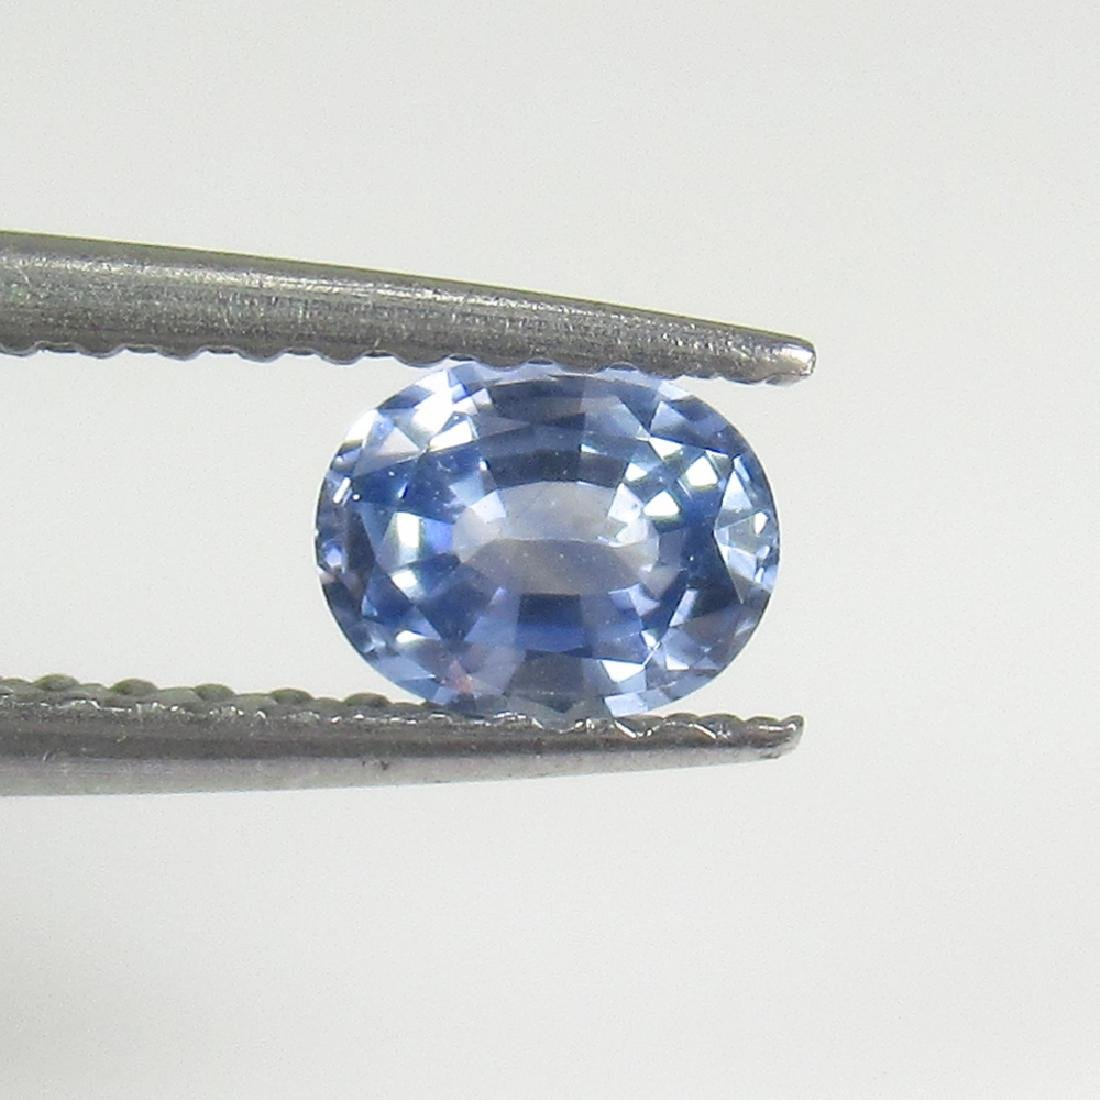 0.41 Ctw Natural Ceylon Blue Sapphire 5X4 mm Oval Cut